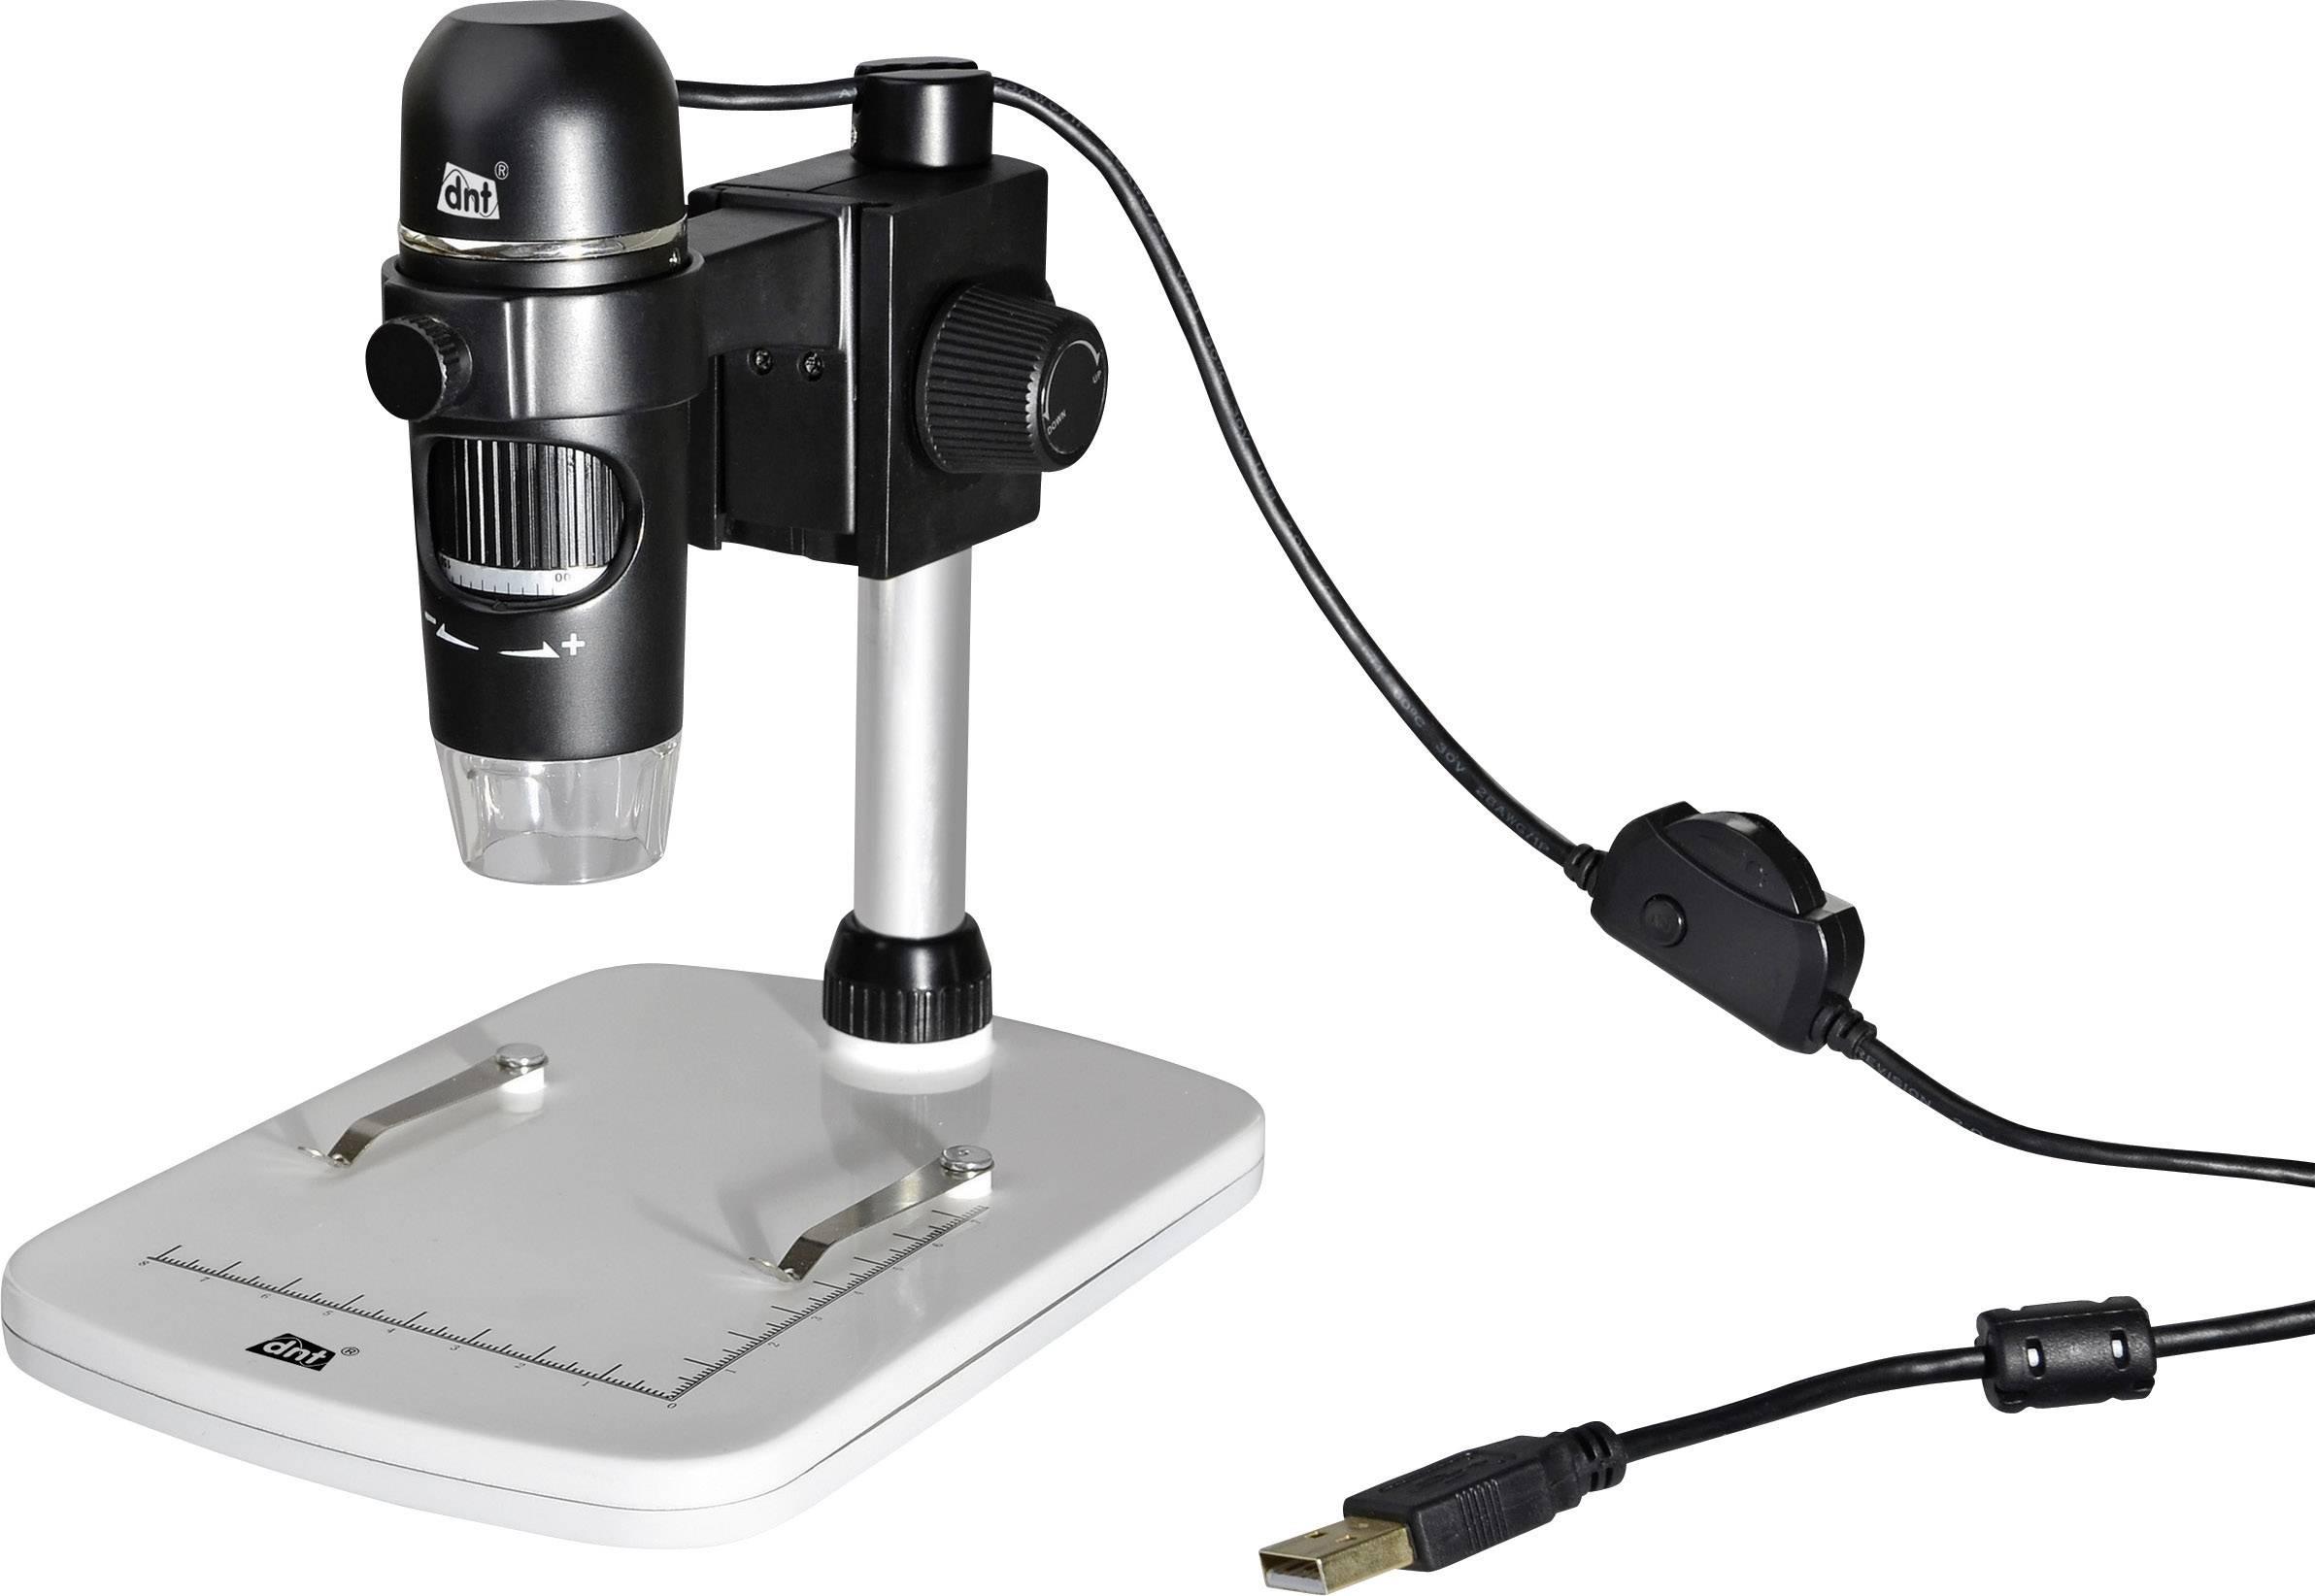 Mikroskop cyfrowy usb toolcraft digimicro profi to 5139594 5 mpx